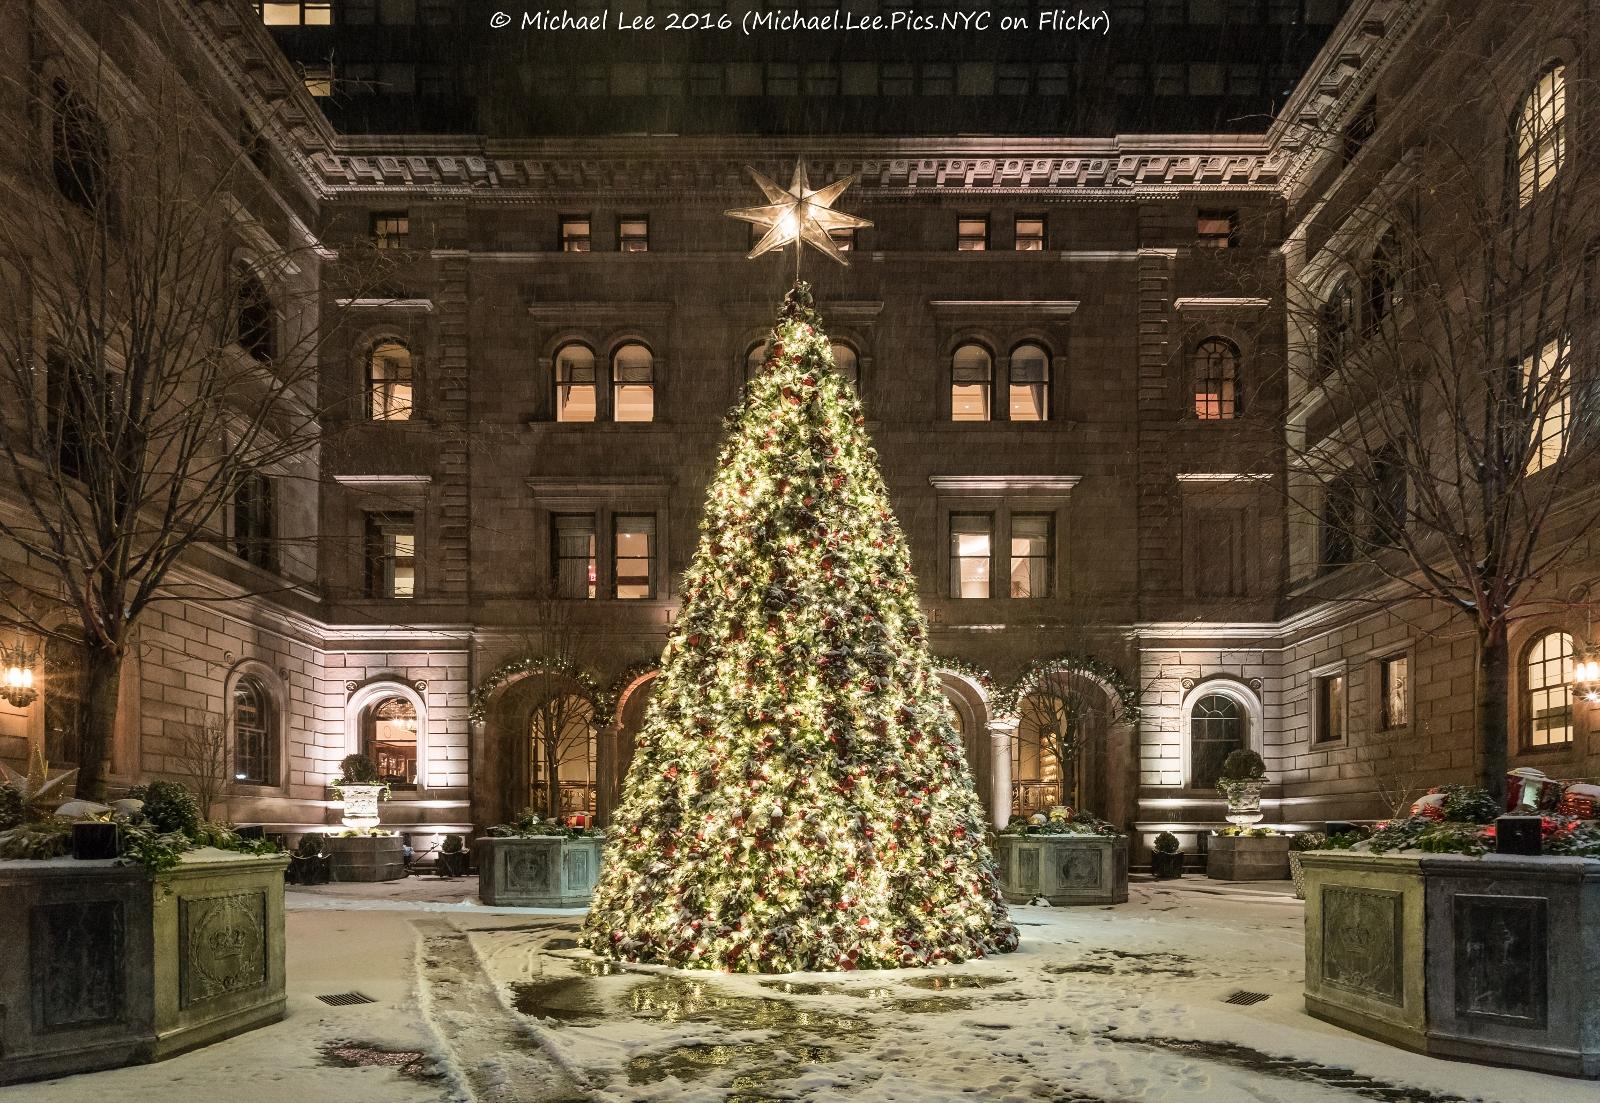 Villard Houses/Lotte New York Palace & Holiday Lights in New York u2013 2016 u2013 Michael Lee azcodes.com